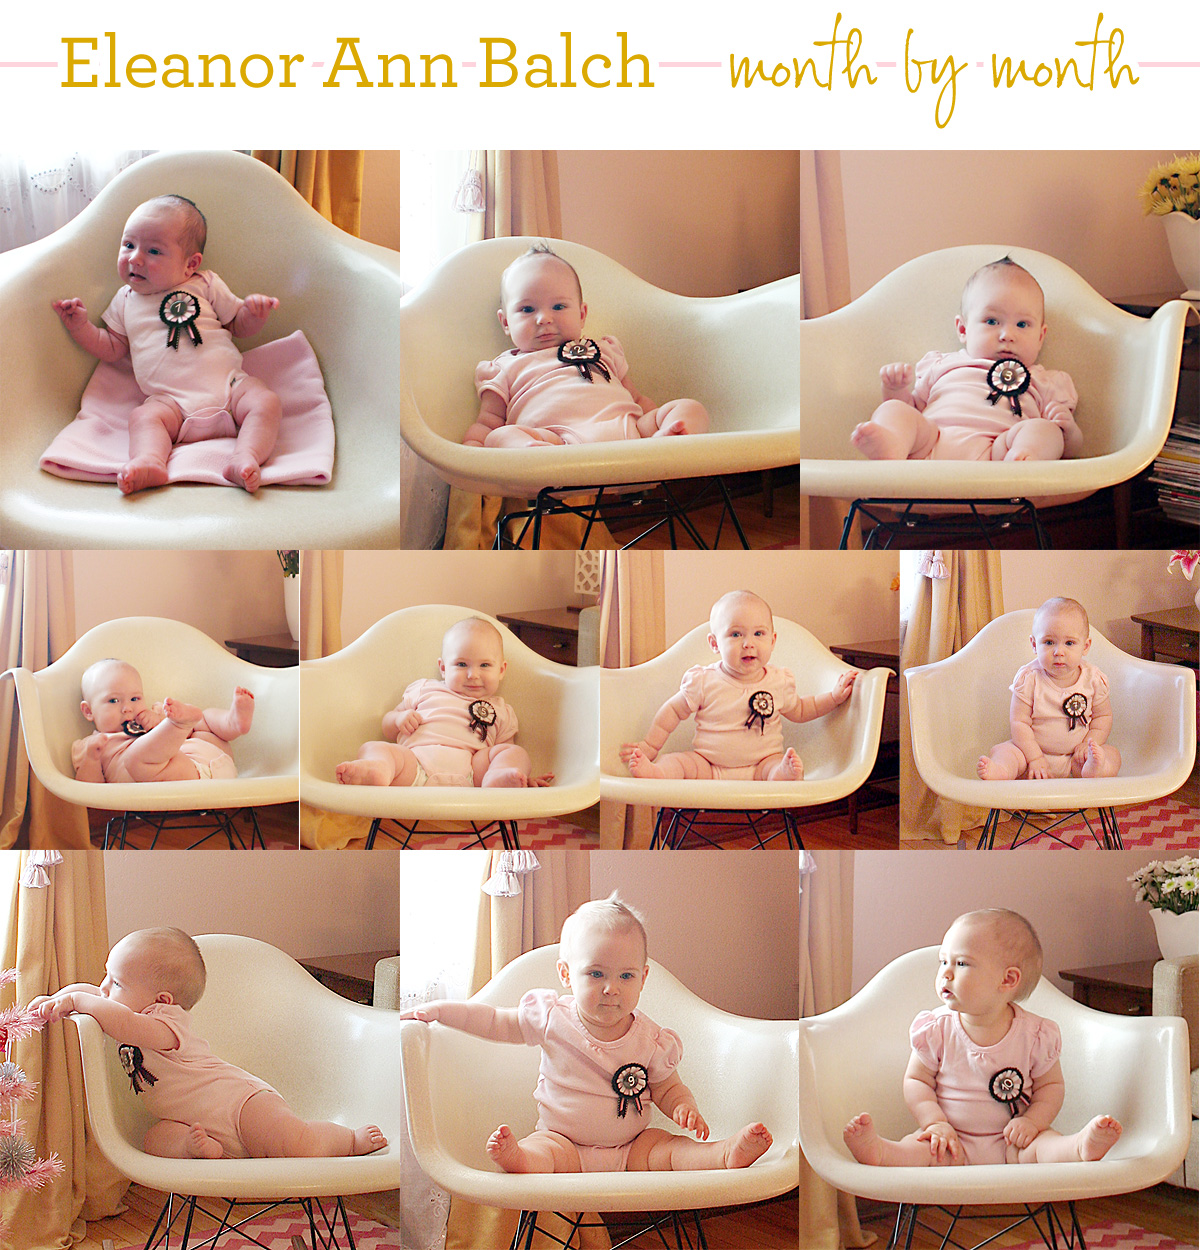 Ten Months Old (Eleanor's Monthly Photo)